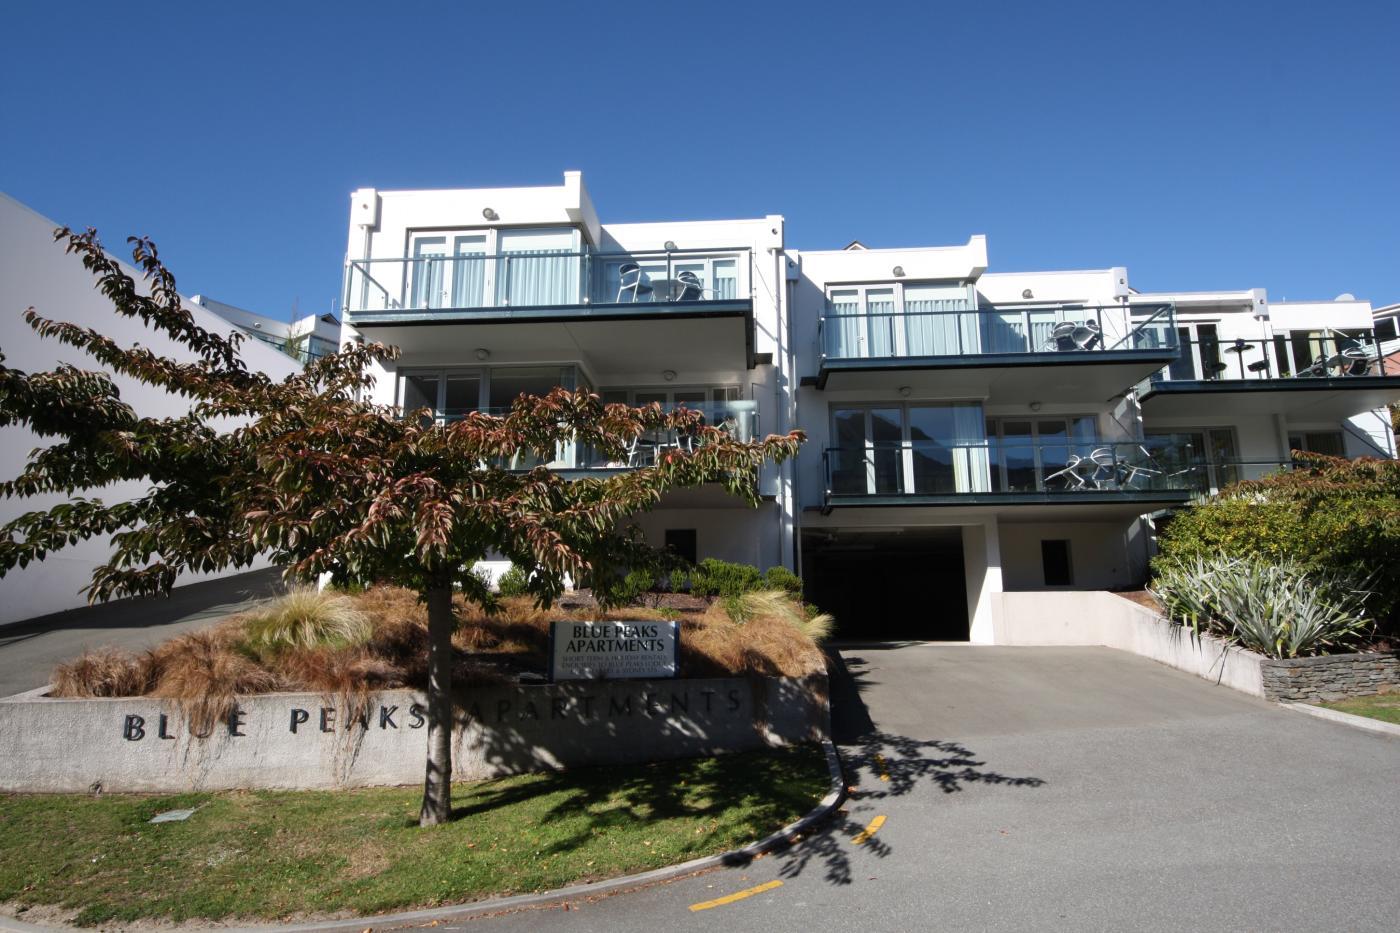 Blue Peaks Apartments exterior, Coronation Drive Queenstown